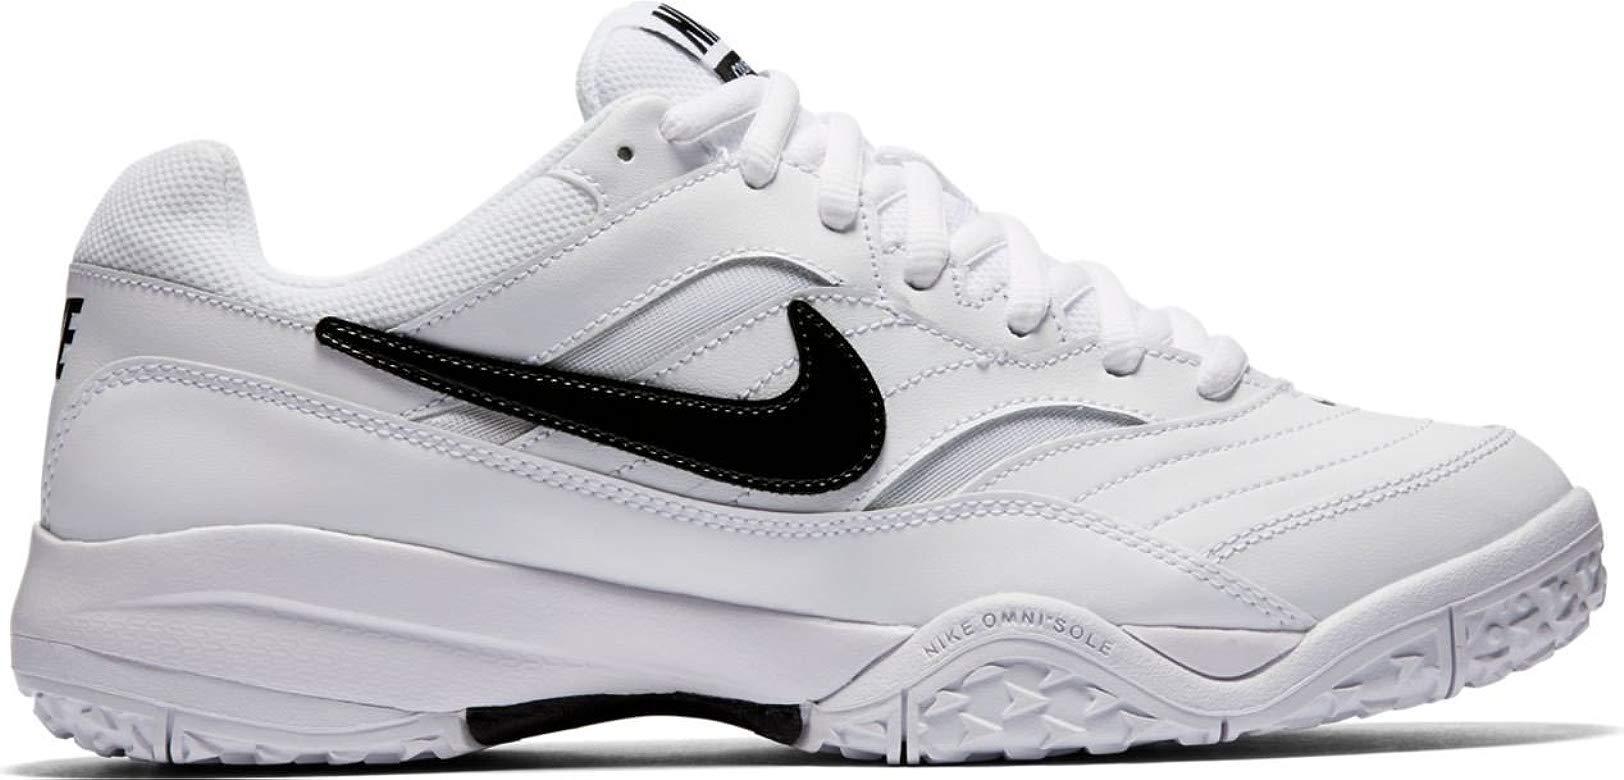 Nike Men's 845027 100 Tennis Shoes, Multicoloured (White